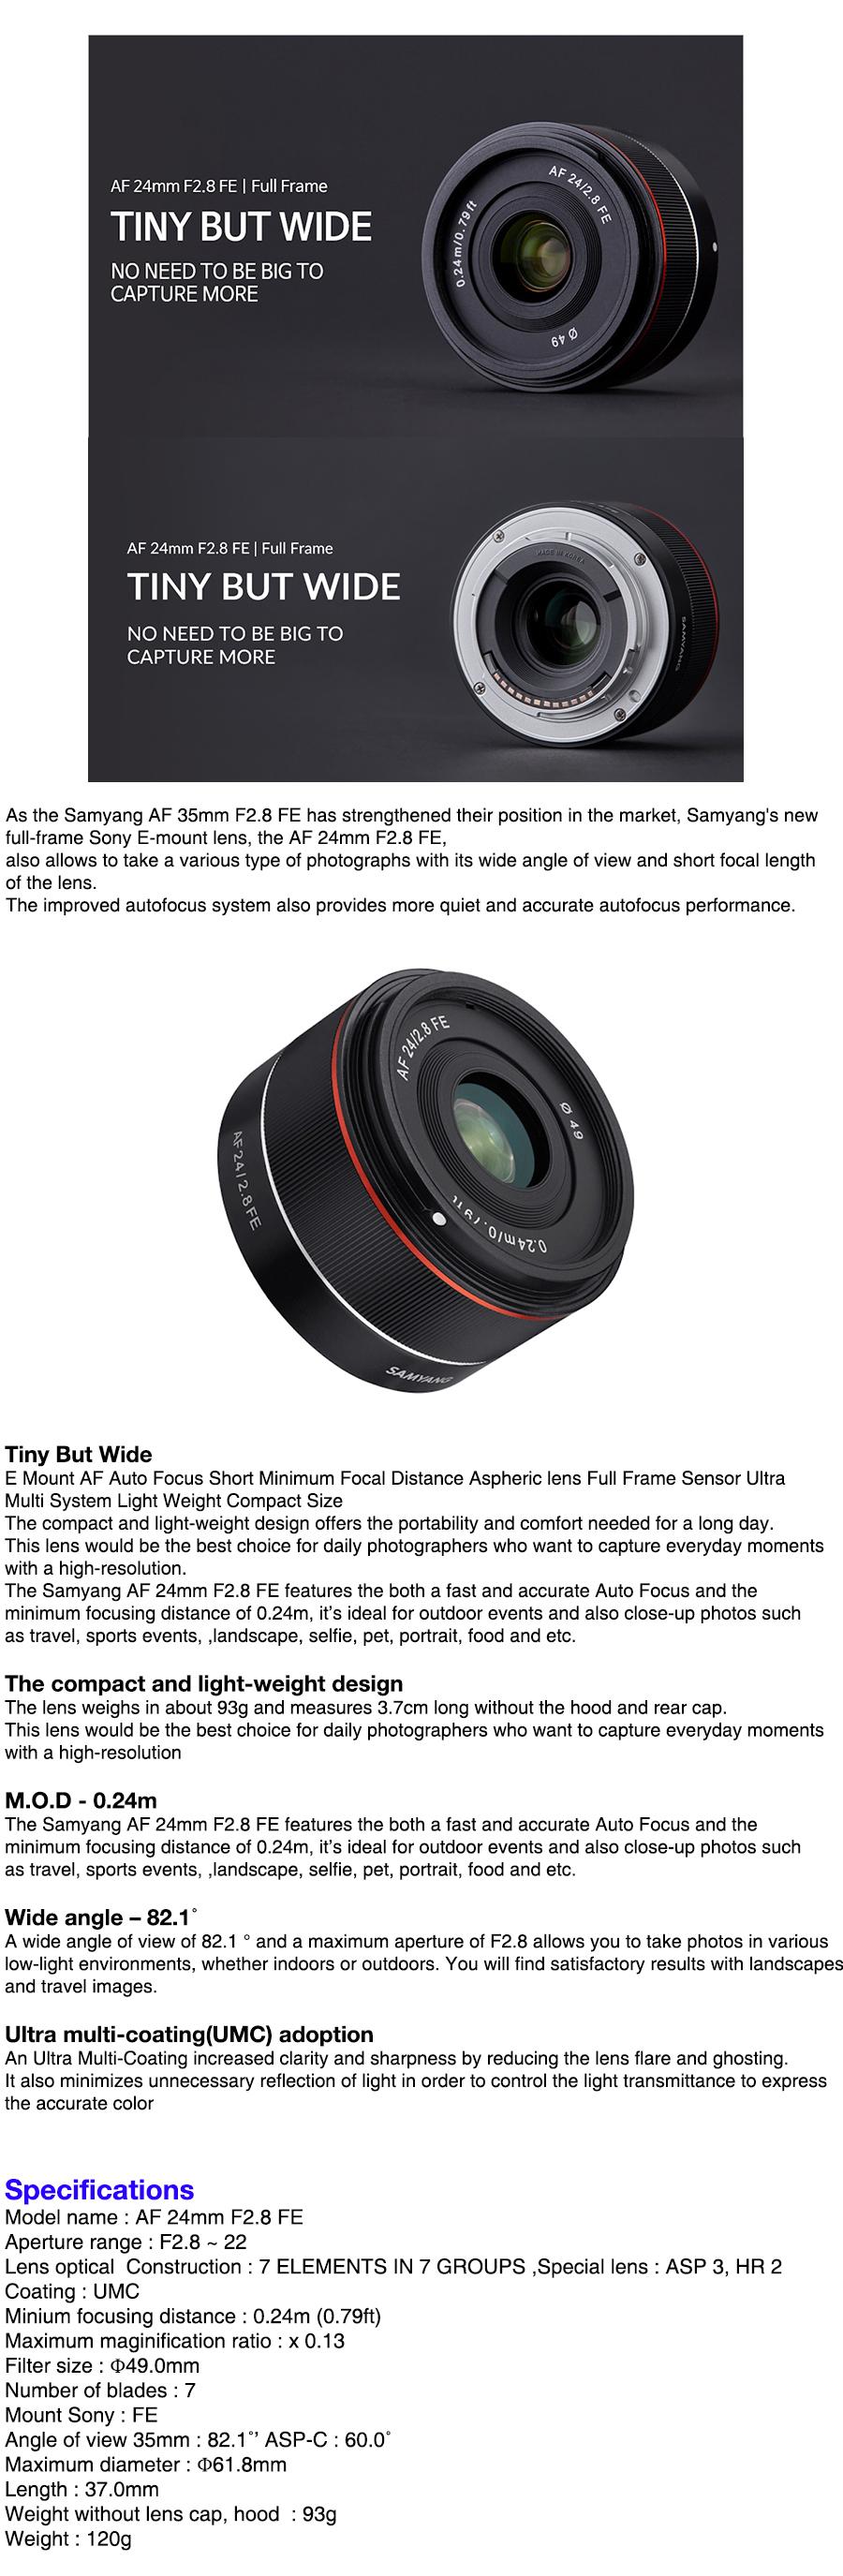 Samyang Optics New AF 24mm F2.8 FE Lens For Sony E-Mount Full Frame ...